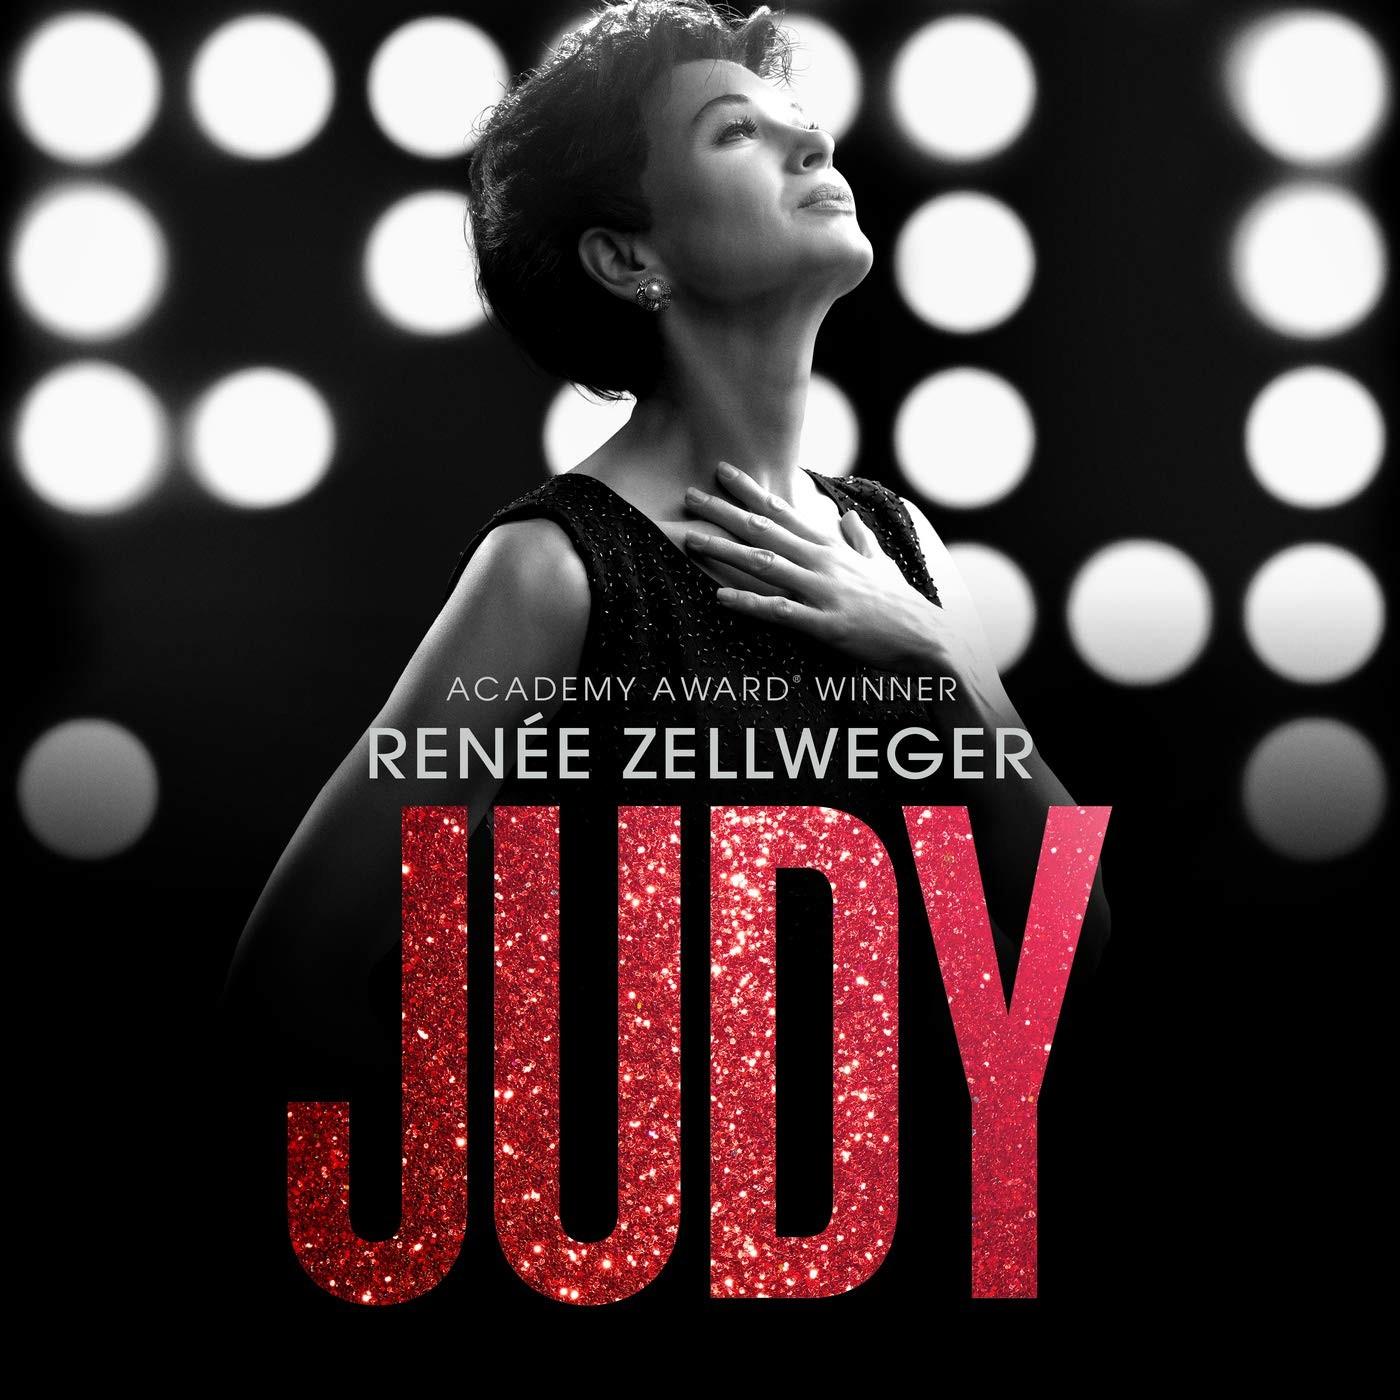 Фильм Джуди Оскар-2020 интересные факты: актриса Джуди Гарленд и Рене Зеллвегер